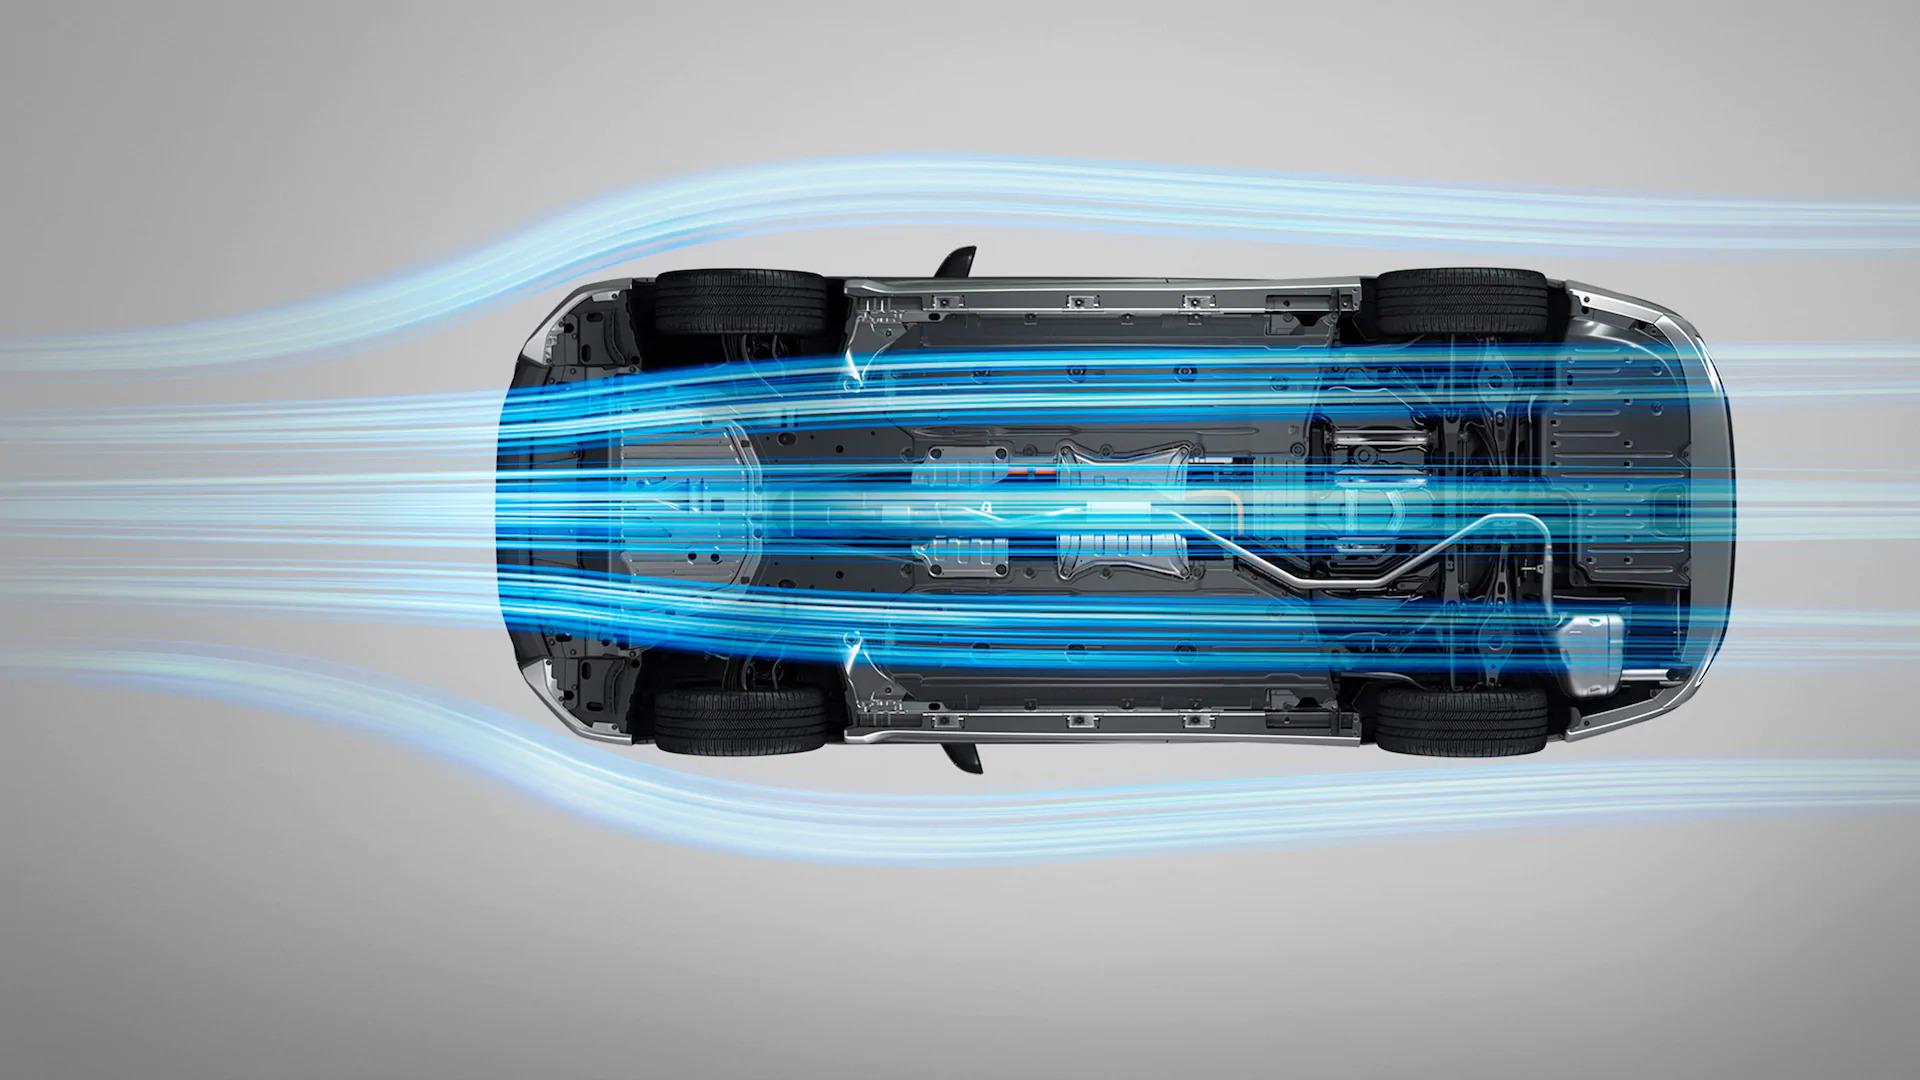 insight efficiency aerodynamics